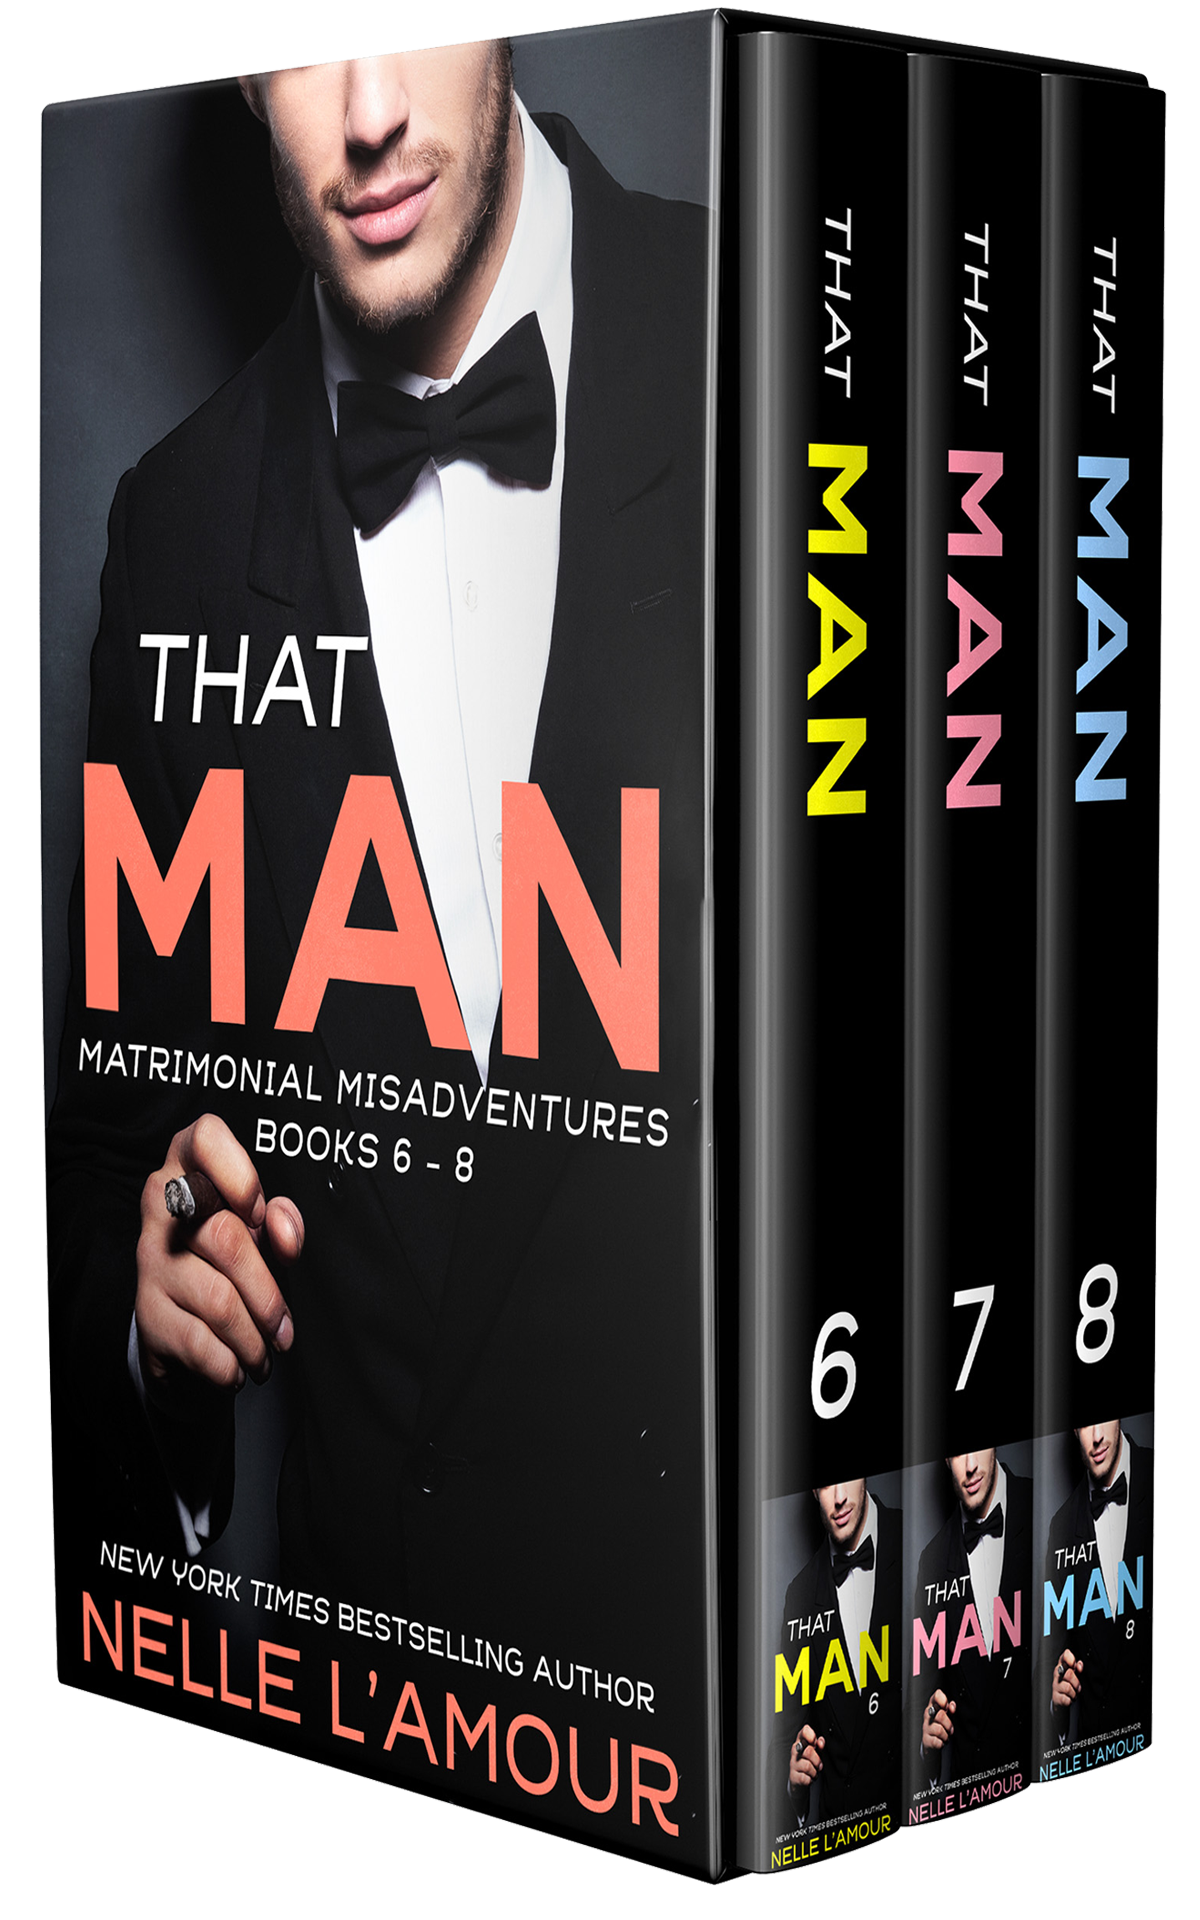 THAT MAN: Matrimonial Misadventures Books 6-8